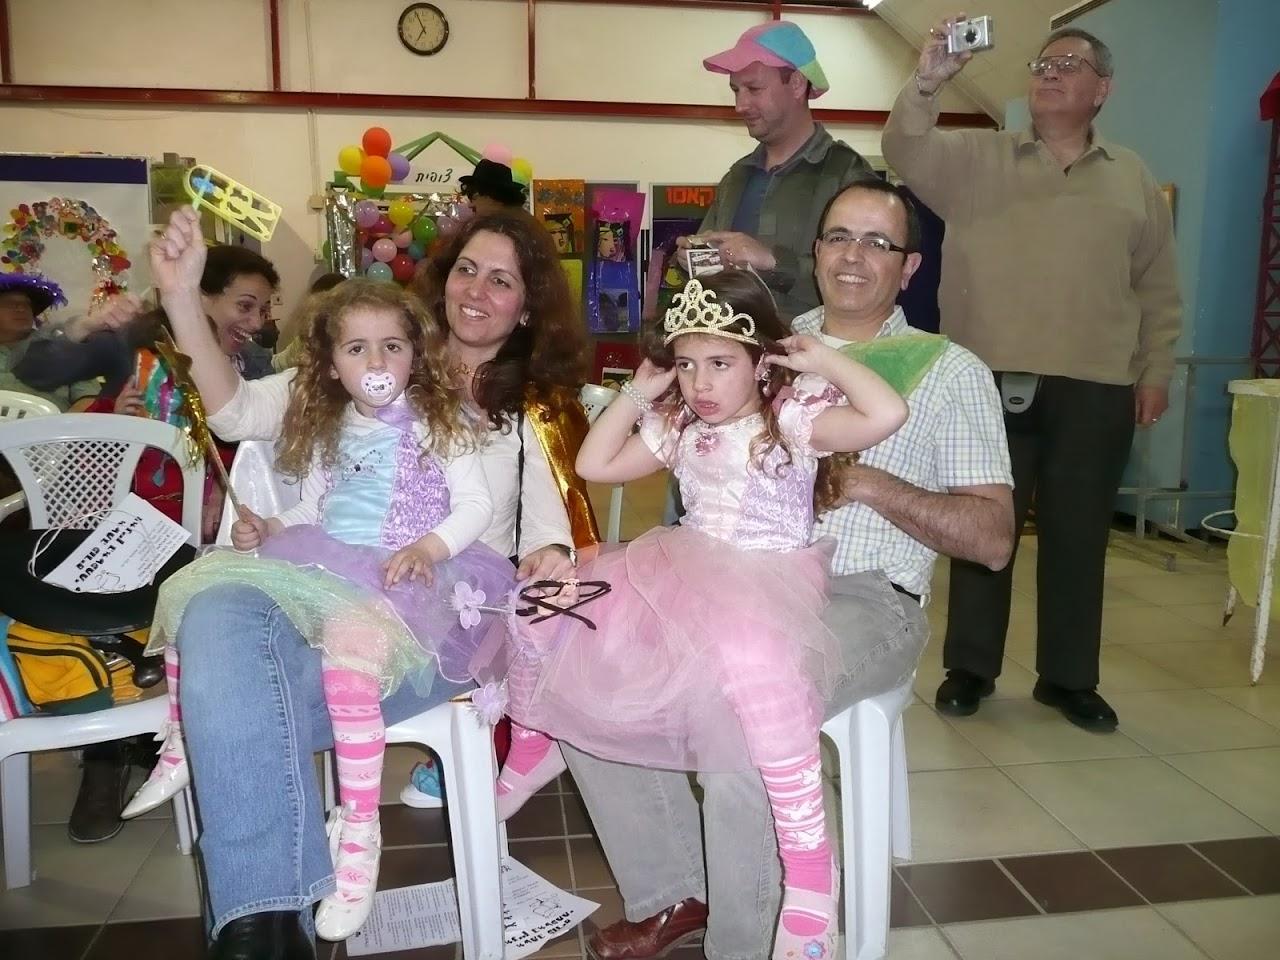 Purim 2008  - 2008-03-20 18.52.56.jpg